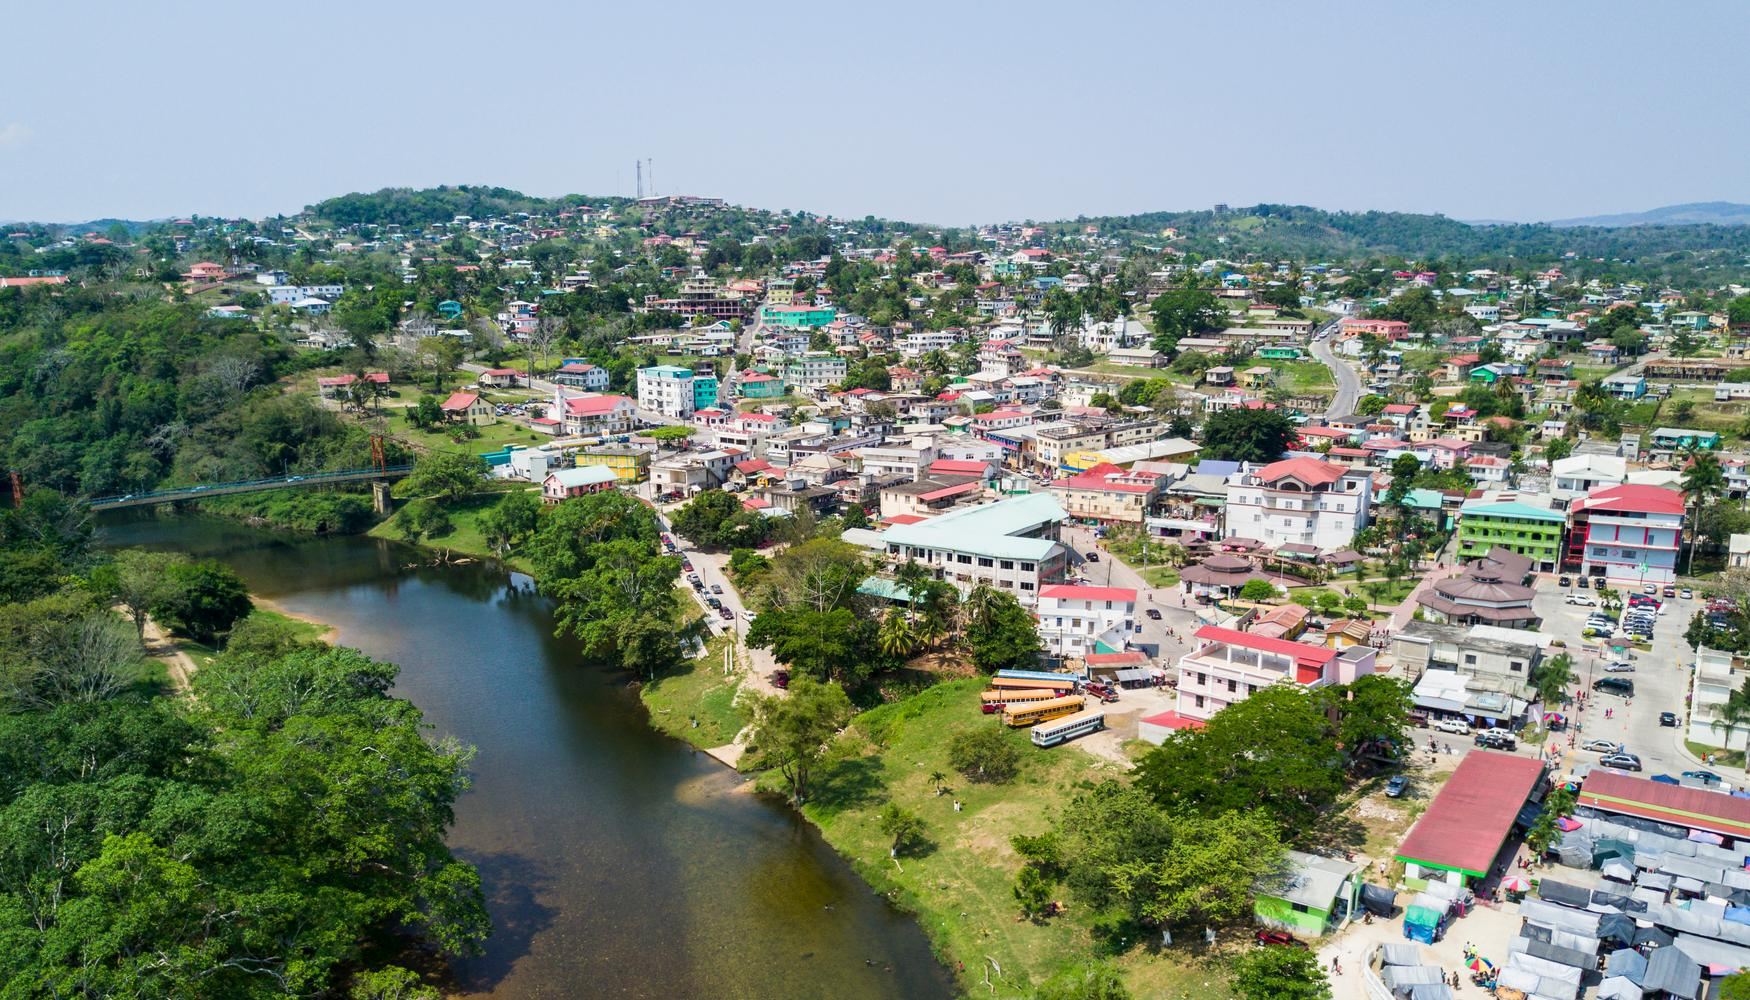 San Ignacio Town and The Macal River